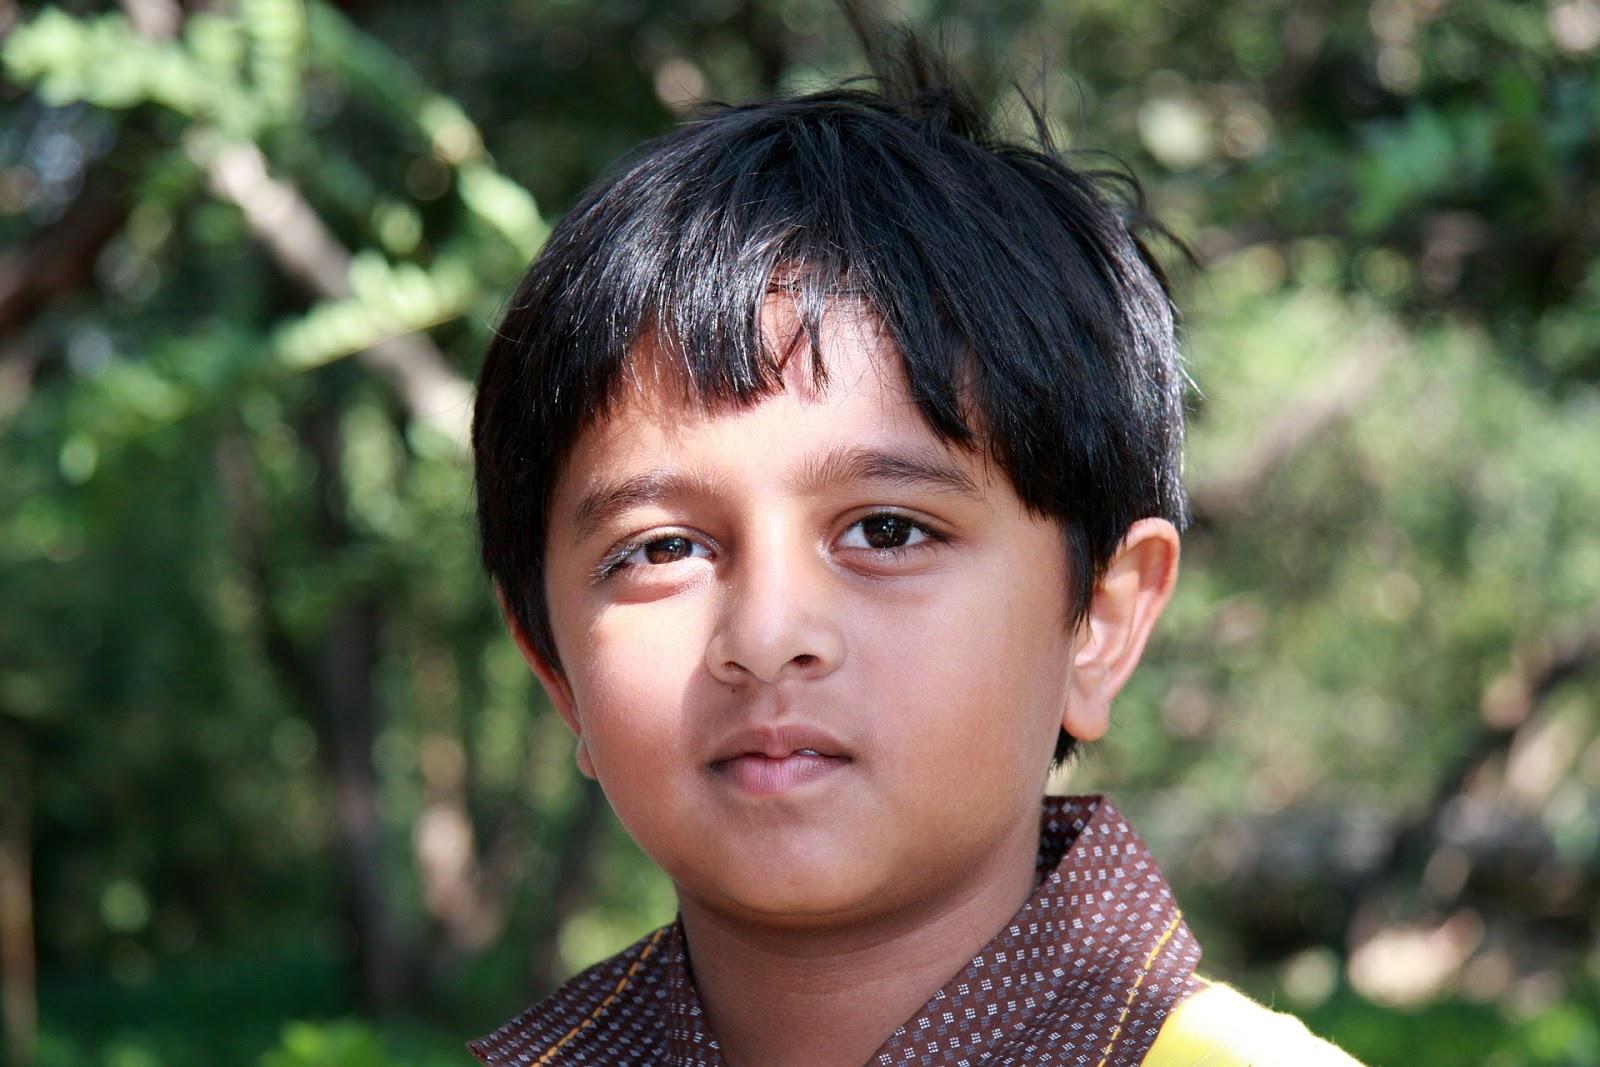 namc montessori circle of inclusion individualization classroom young boy